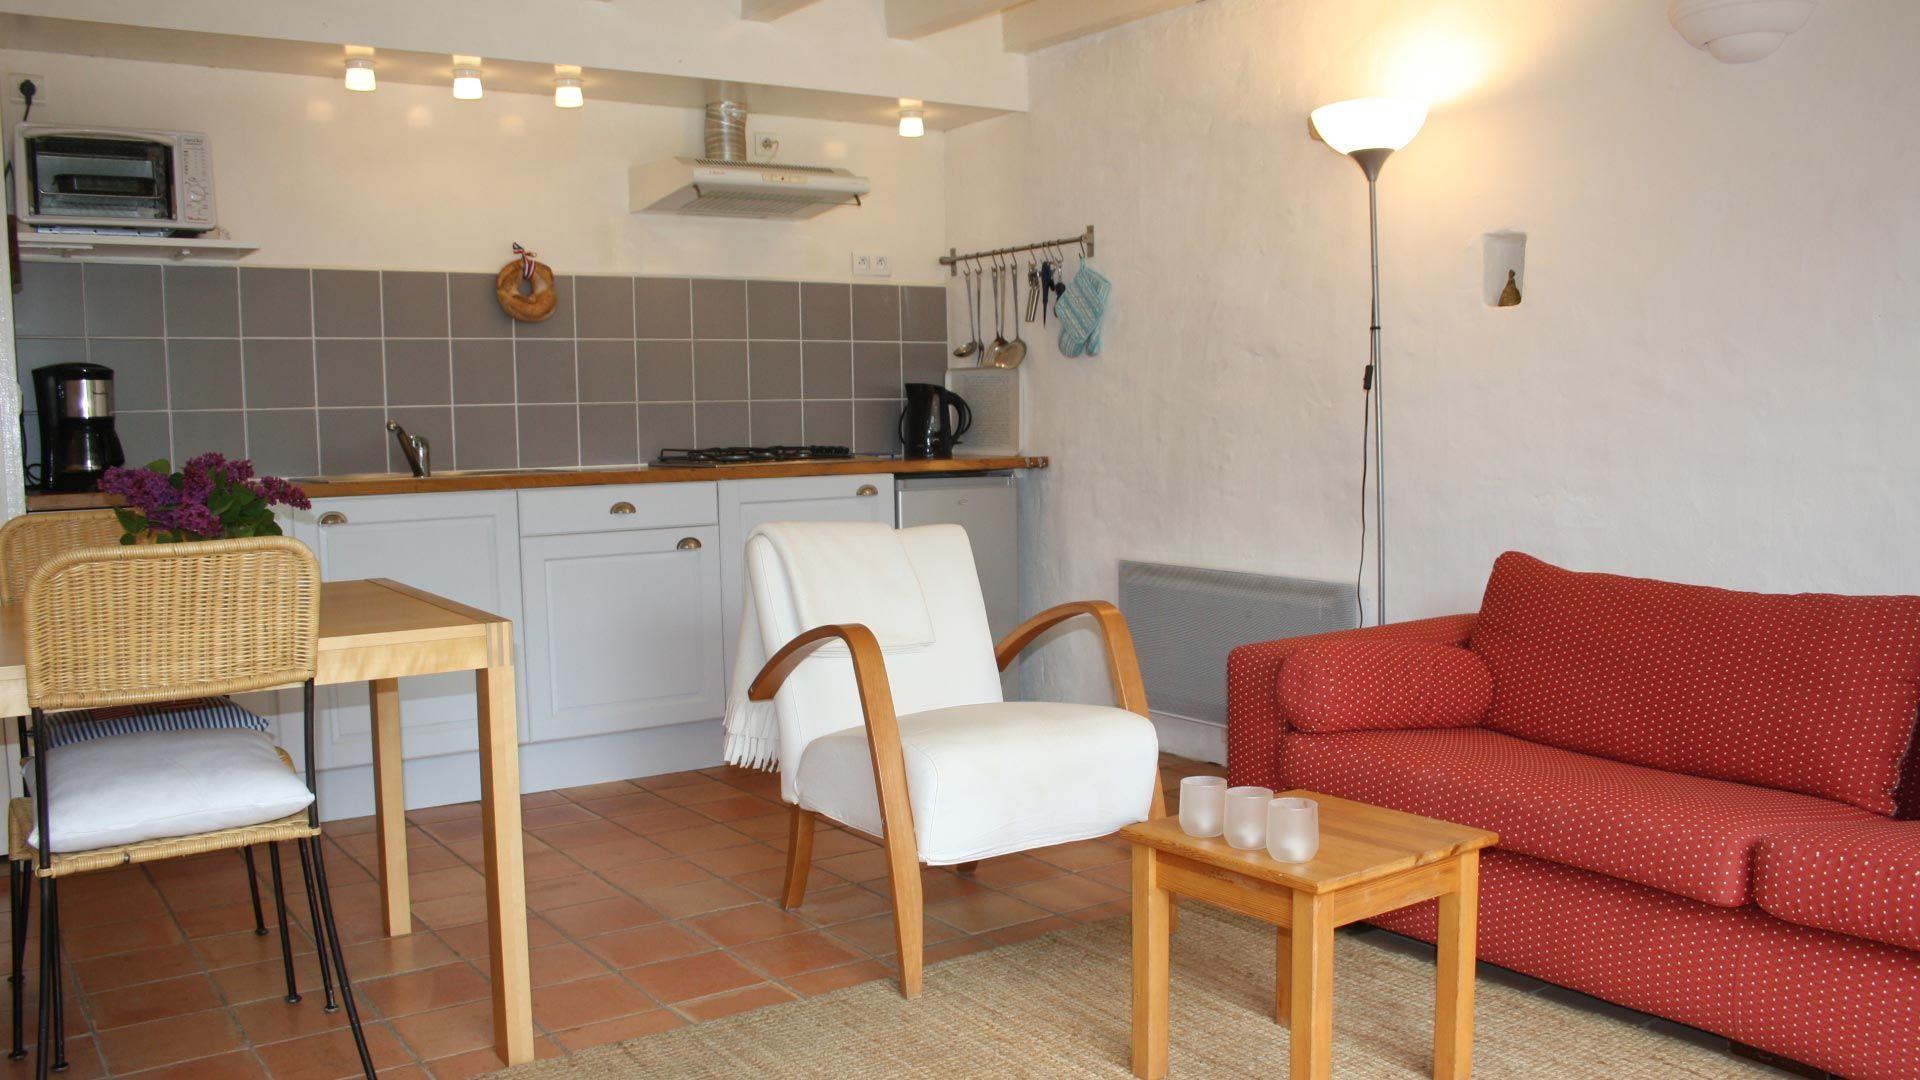 Bekijk vakantiehuis Sol Rouge in Tarn - Midi-Pyrénées - Gites.nl